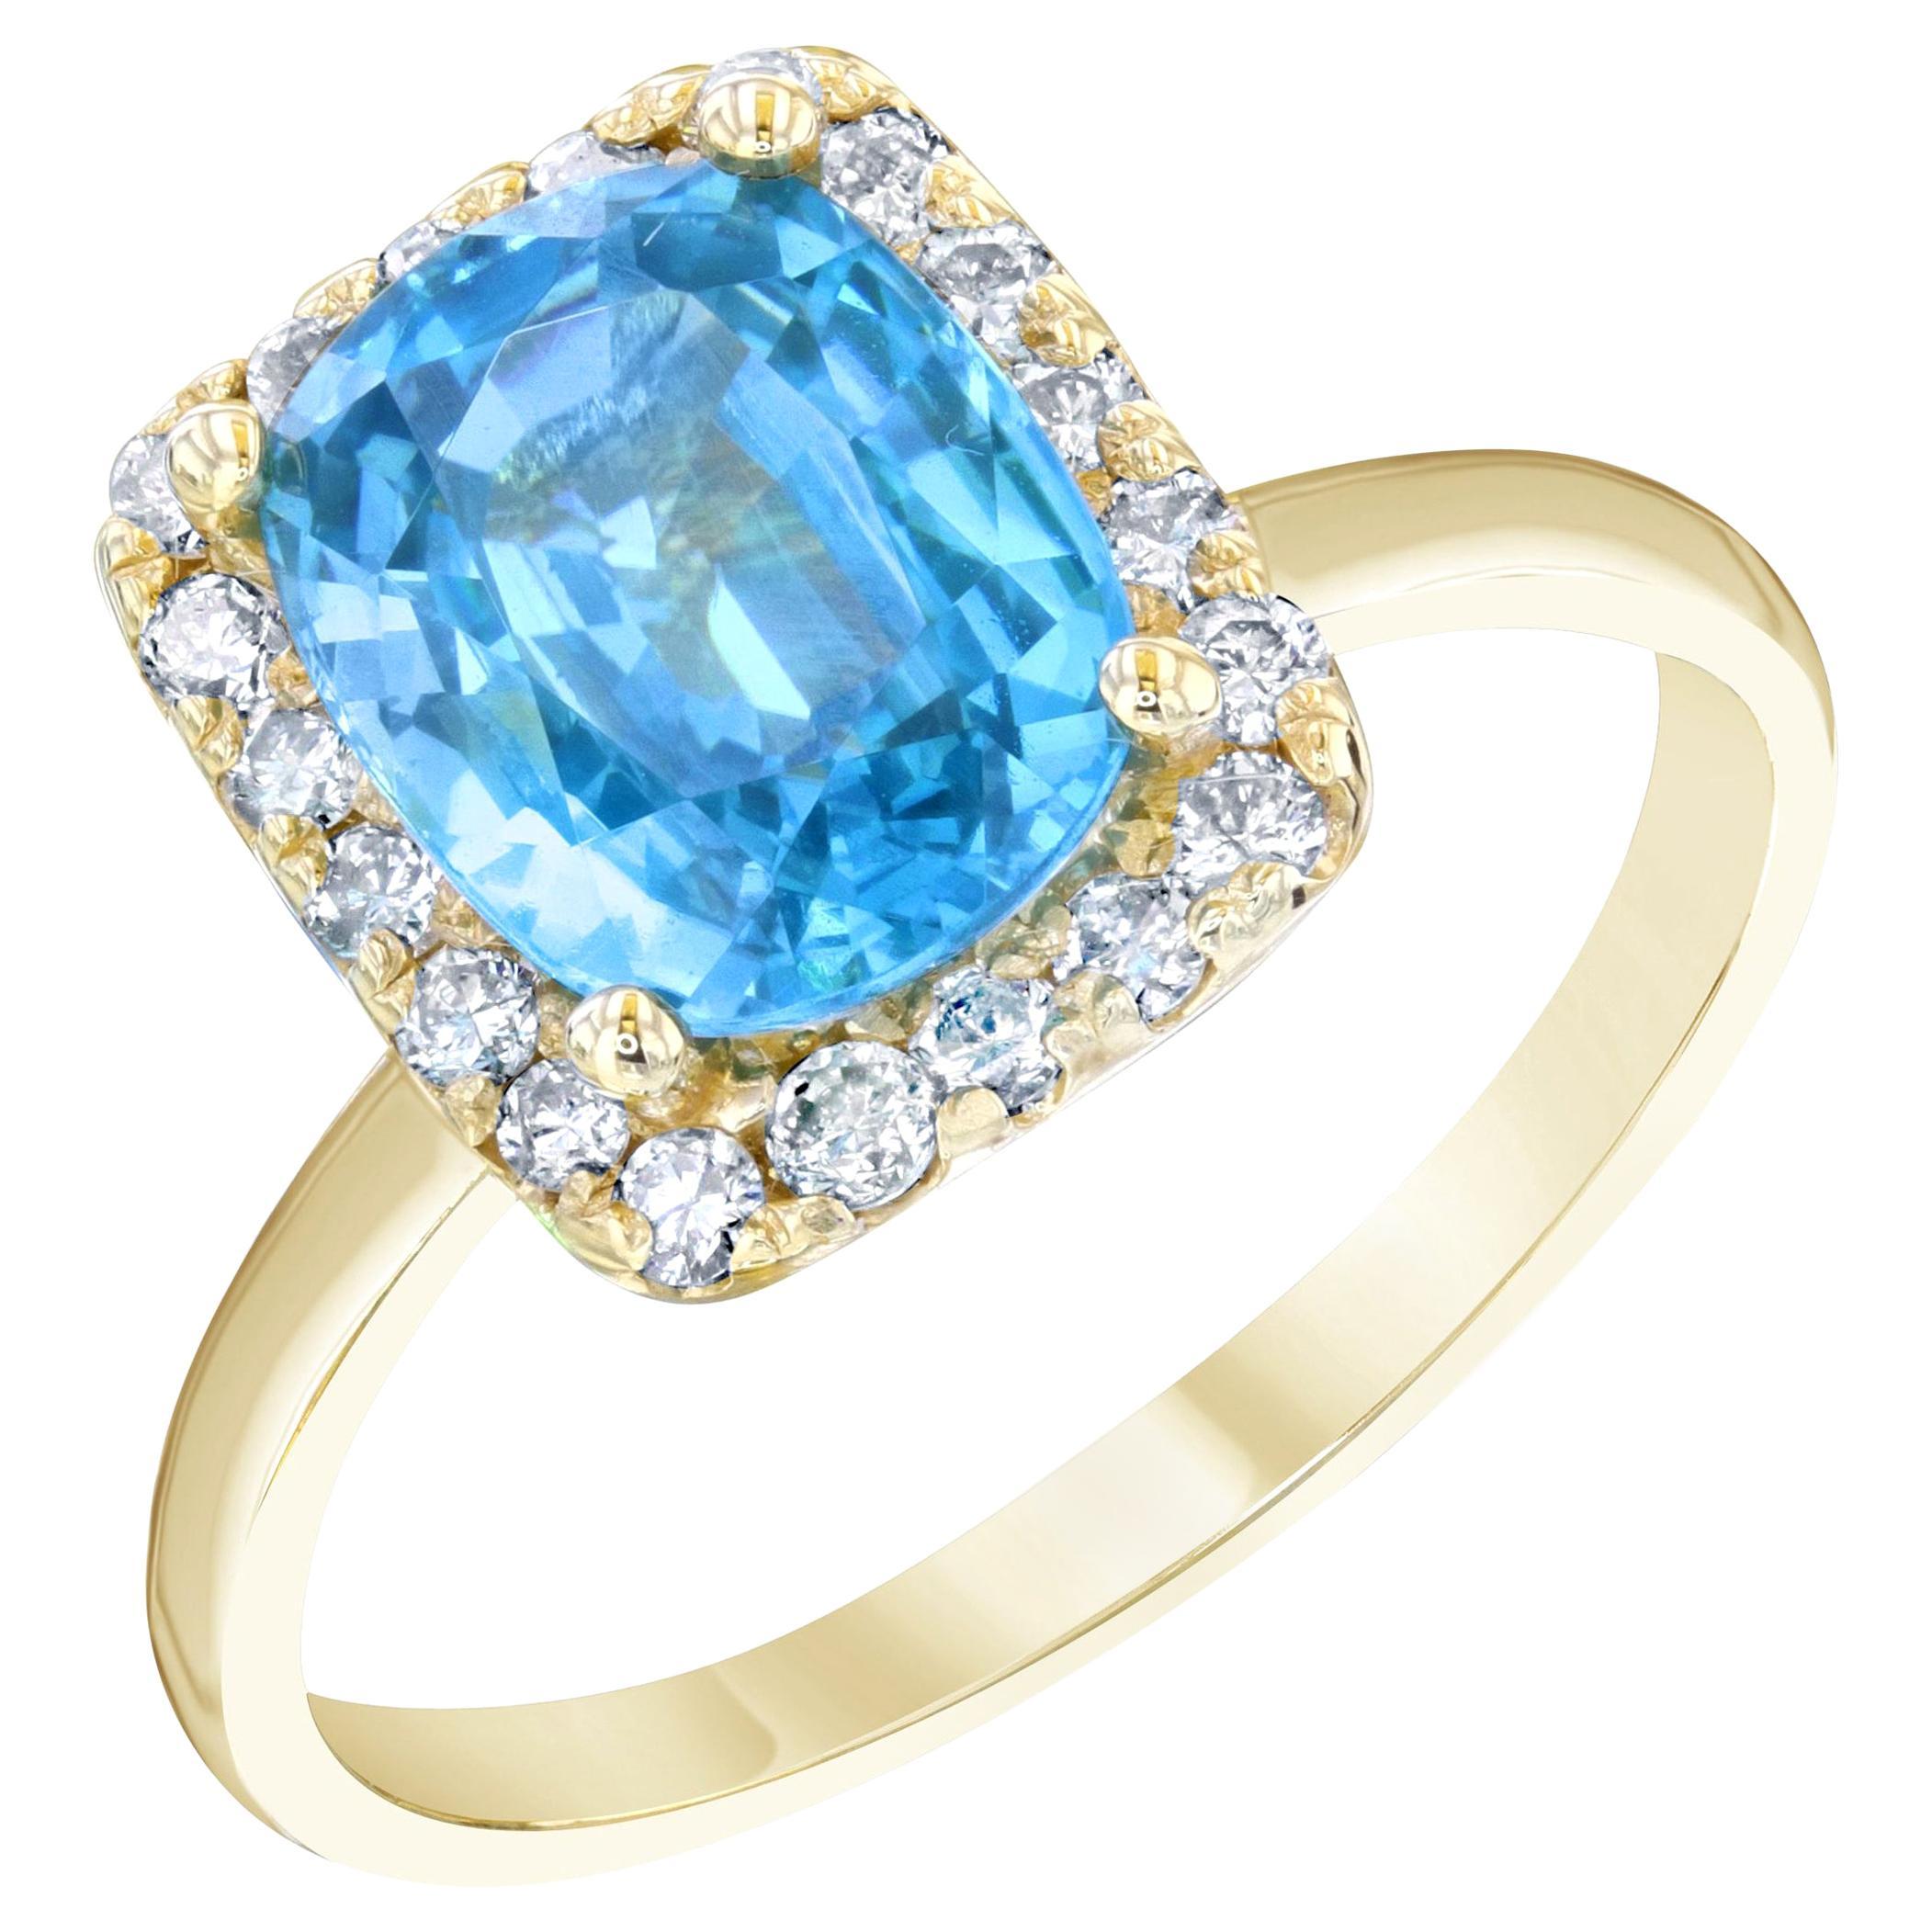 3.93 Carat Blue Zircon Diamond 14 Karat Cocktail Ring